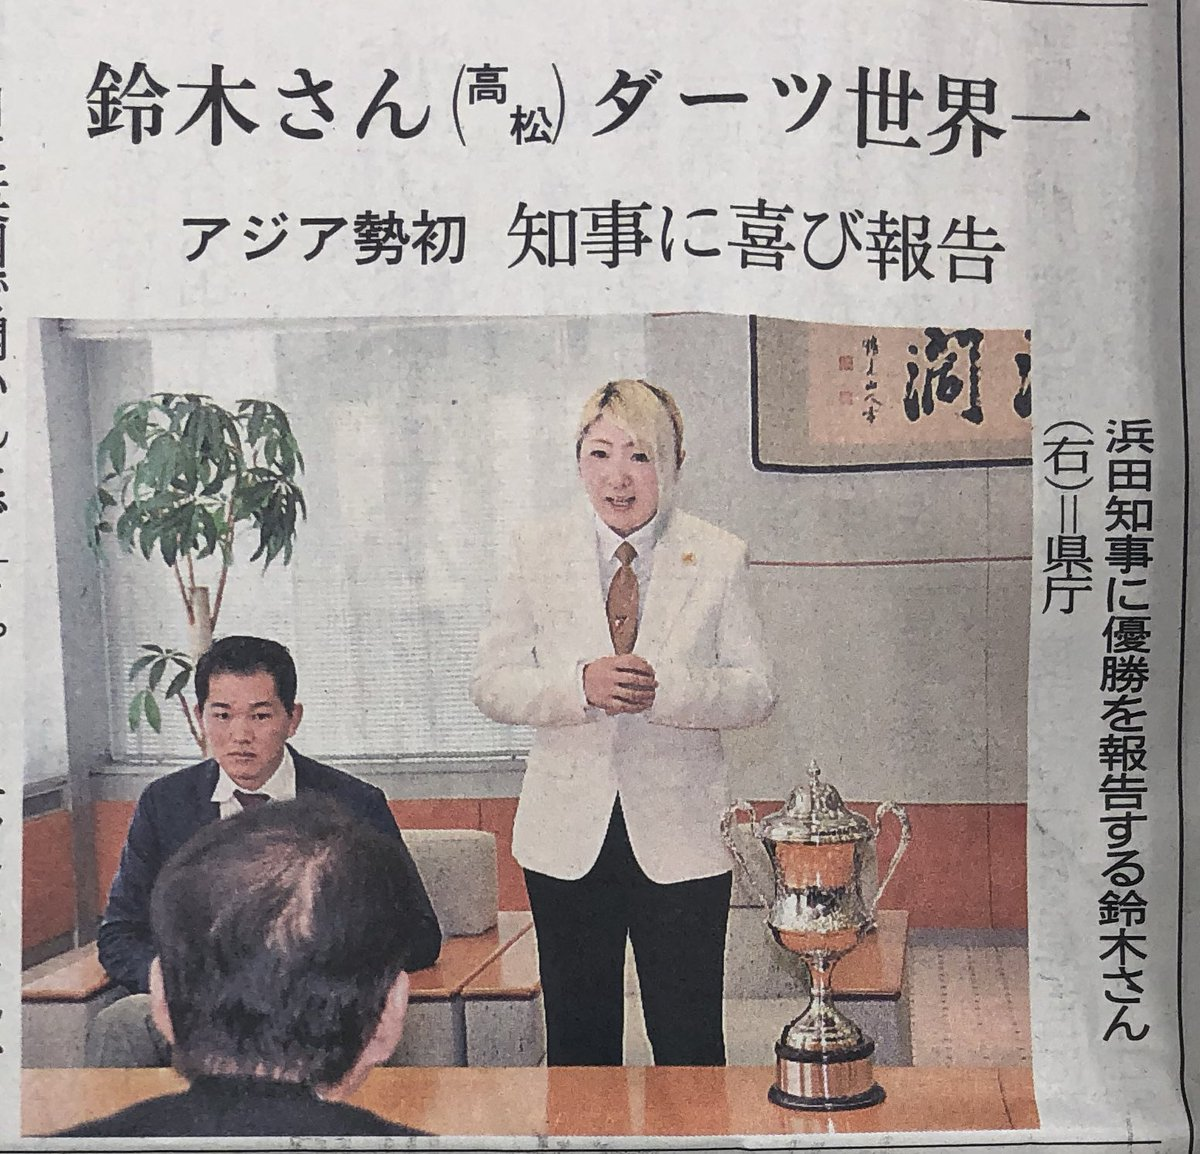 RT @B1000uk: 今日の四国新聞朝刊に載ってた。  金髪、白ジャケット、金ネクタイ 知事と市長は「すごいの来たなぁ」って思ったのかなぁ?  #miraclemikuru https://t.co/1EK4KjclsC